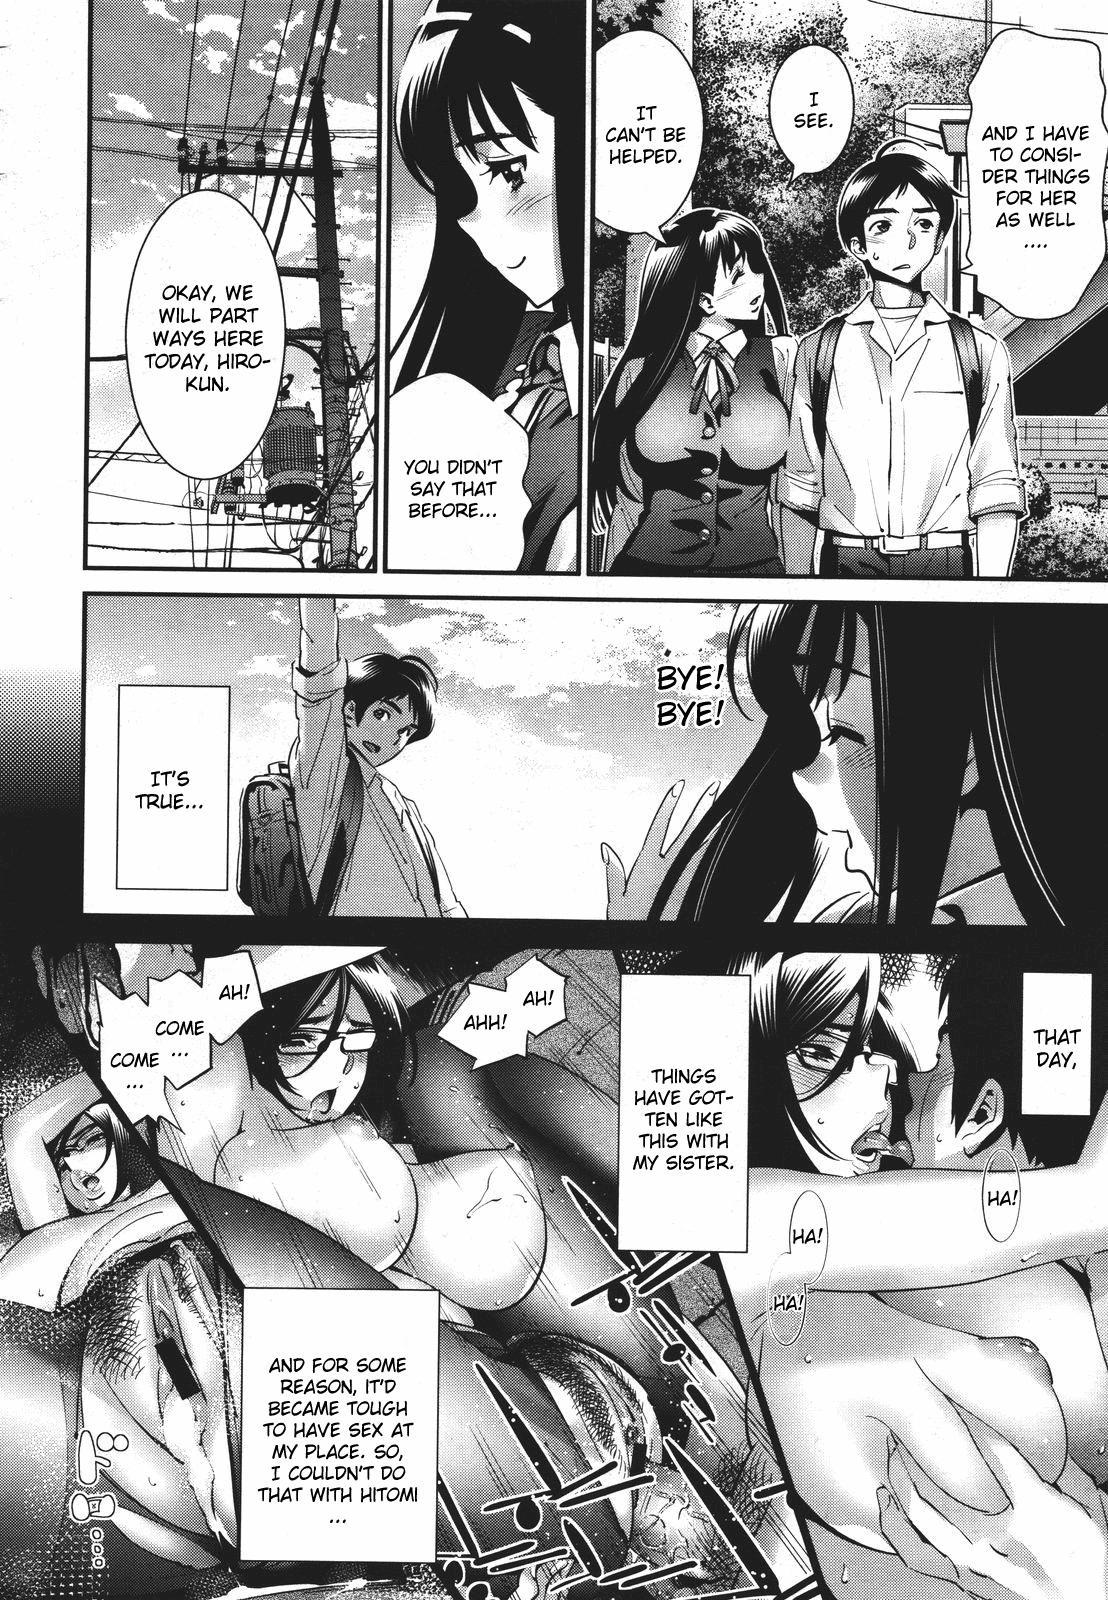 Megane no Megami Chapter 3 11